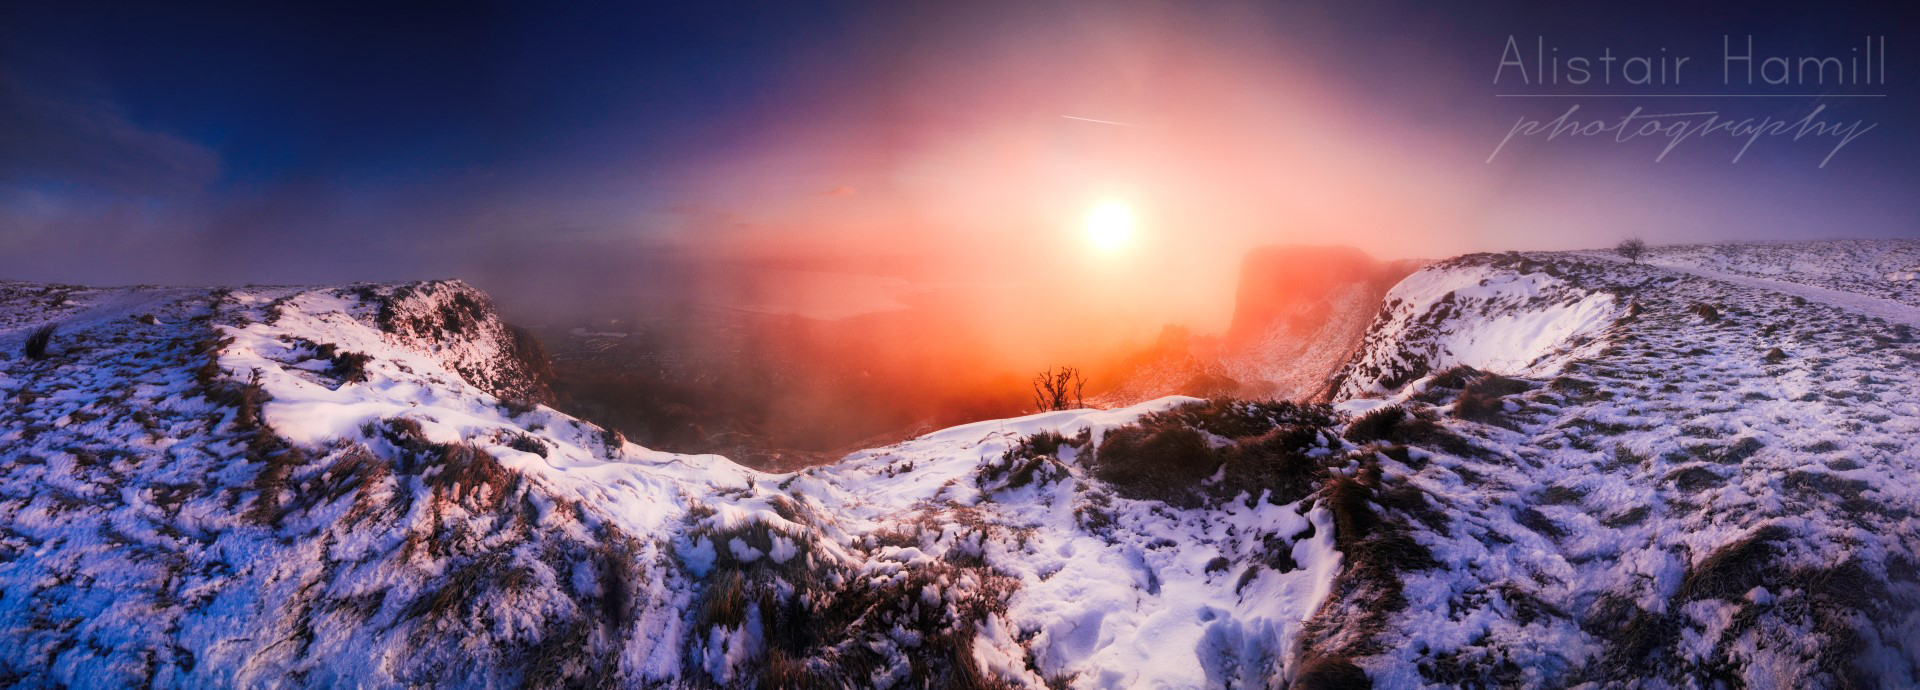 Misty snowy pano 2 more orange (Large) wm.jpg